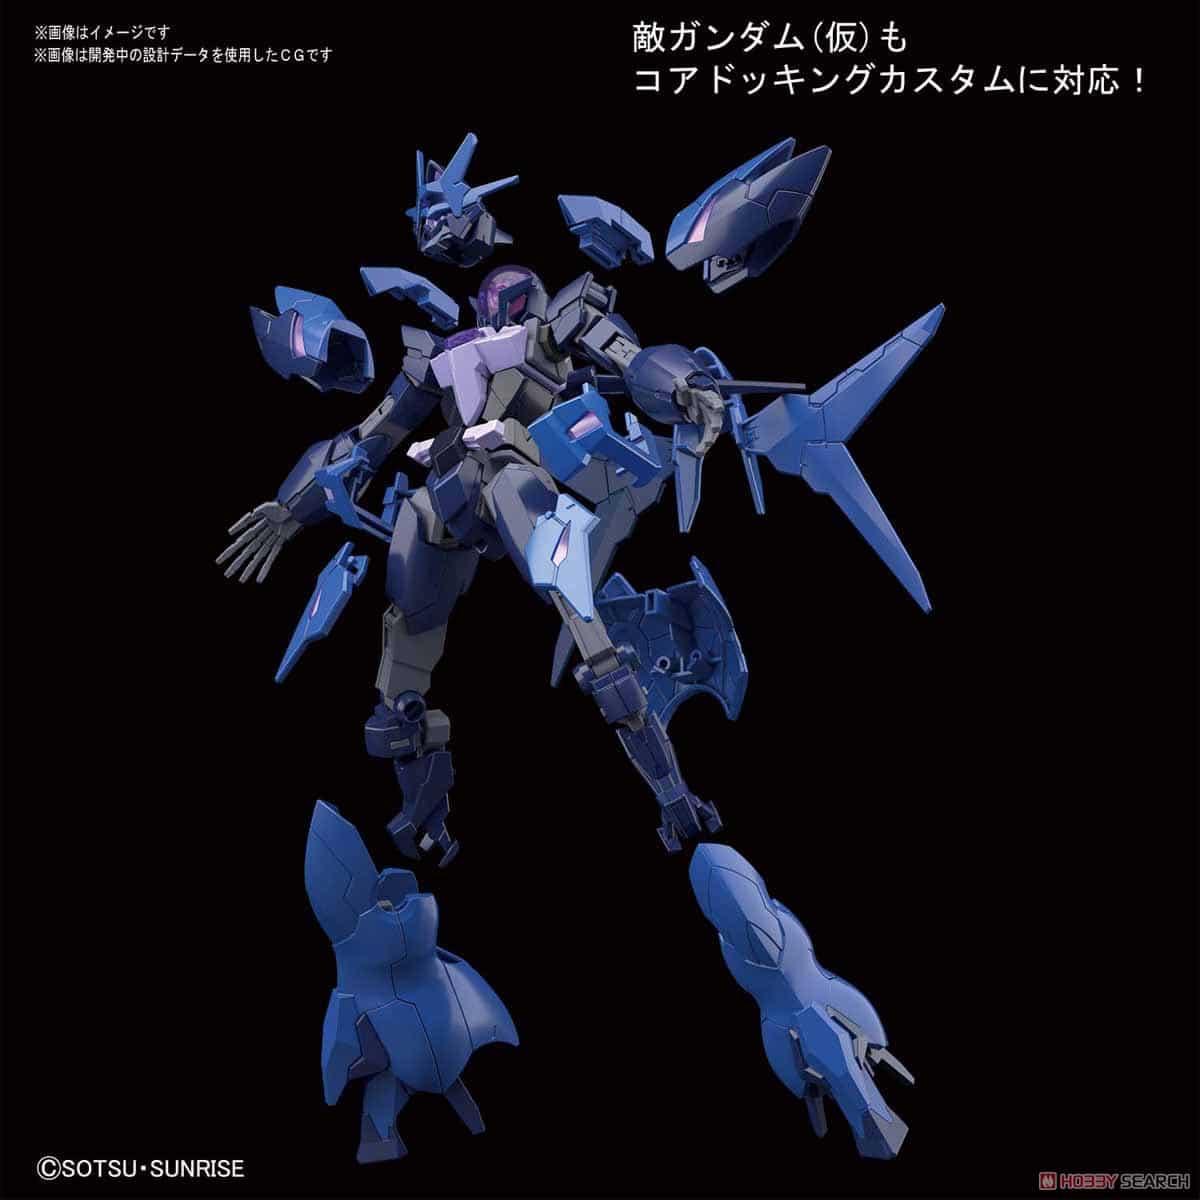 High Grade Enemy Gundam - Tentative Pose 3